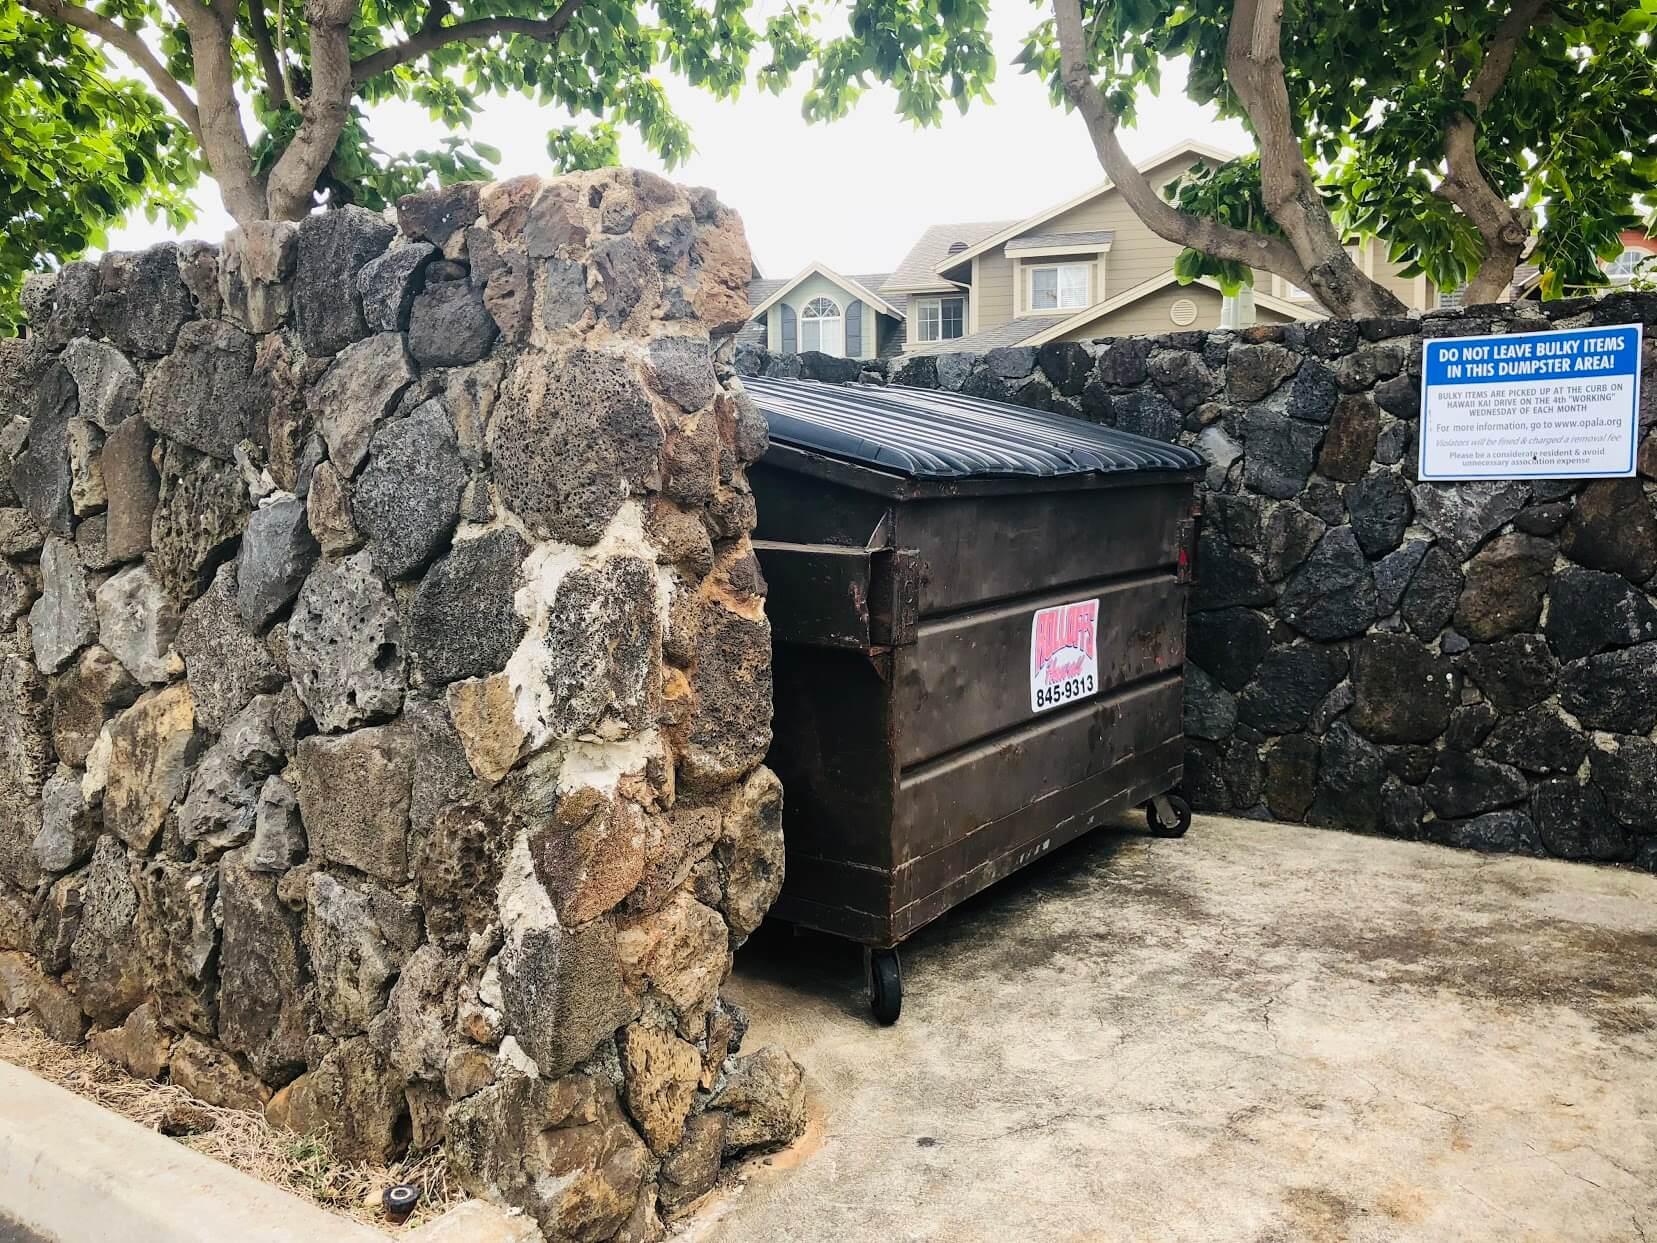 Nanea Kaiのゴミ箱